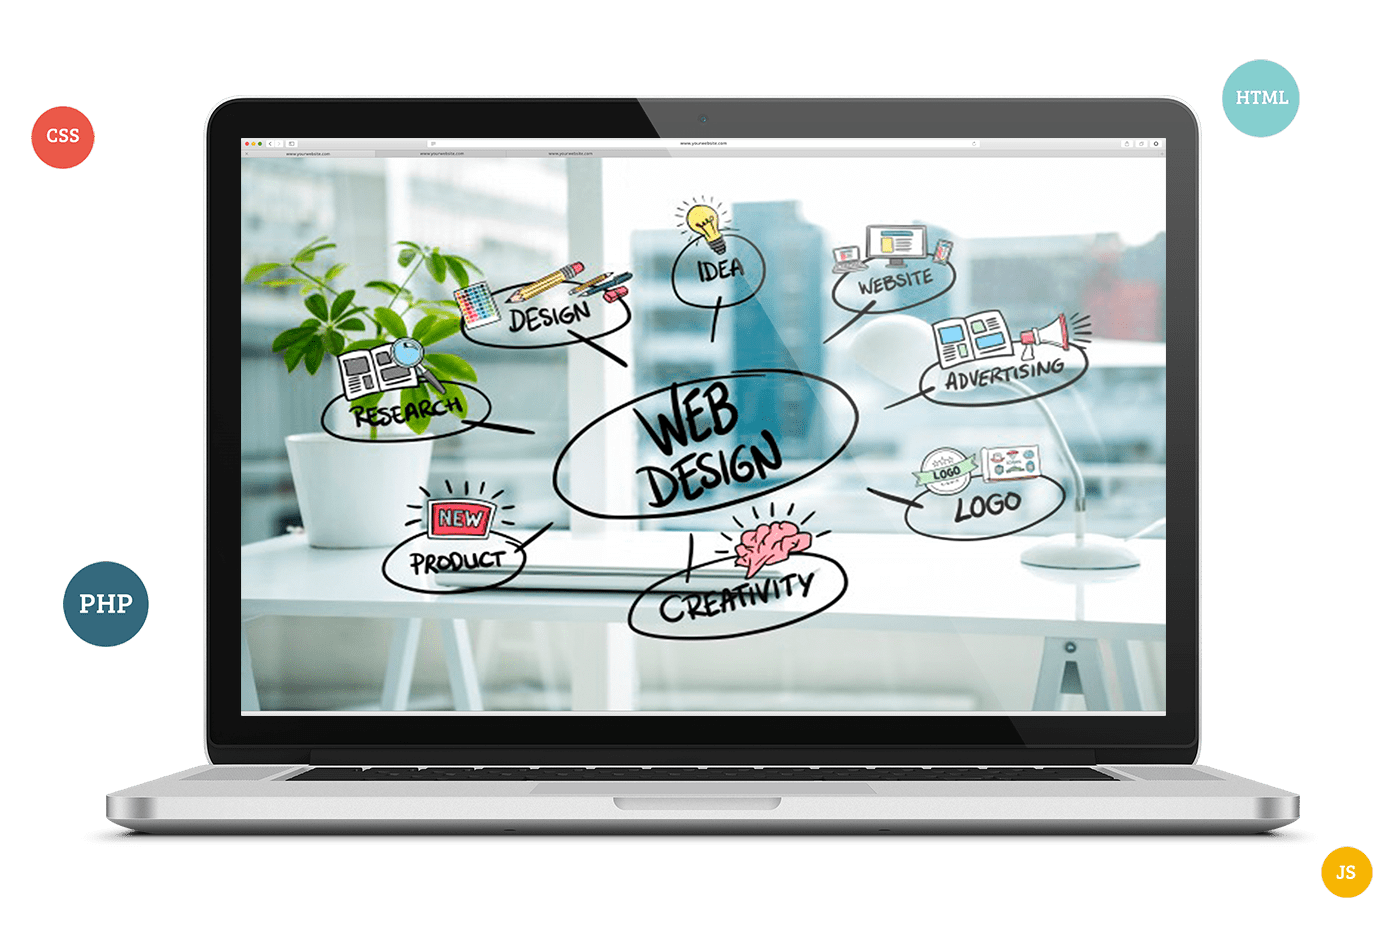 I need a website for my company